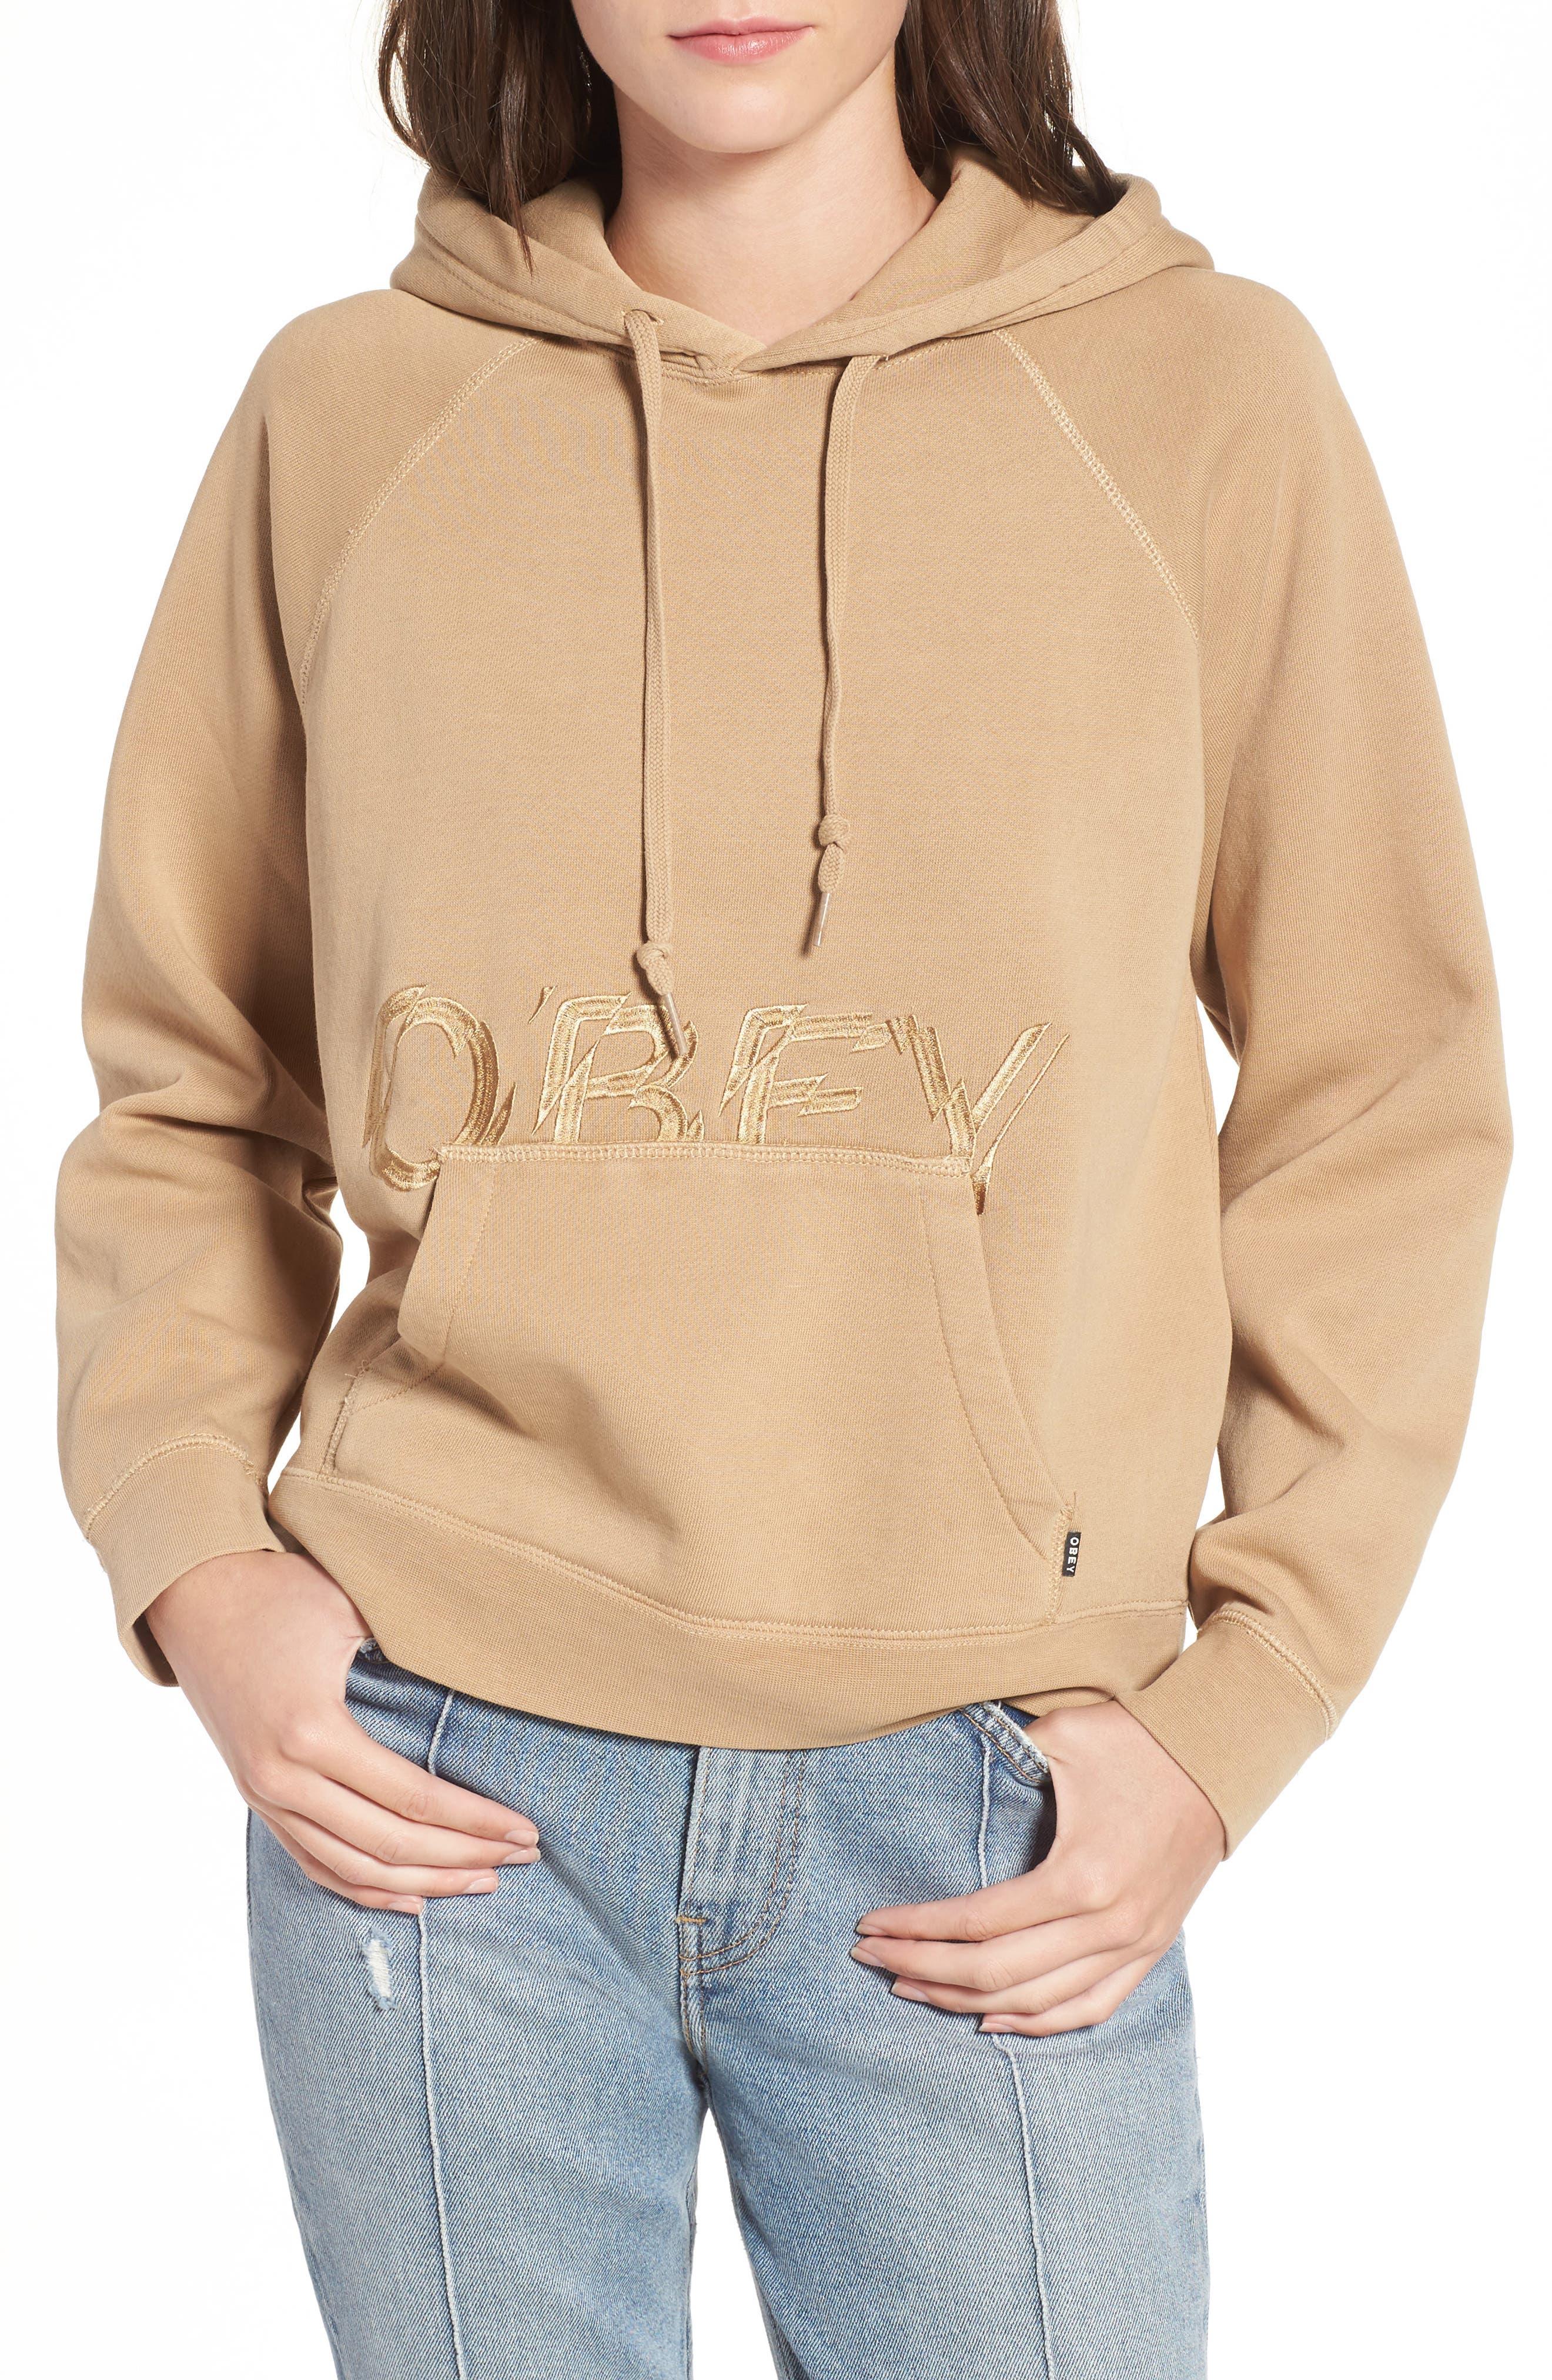 Alternate Image 1 Selected - Obey Parkside Hooded Pullover